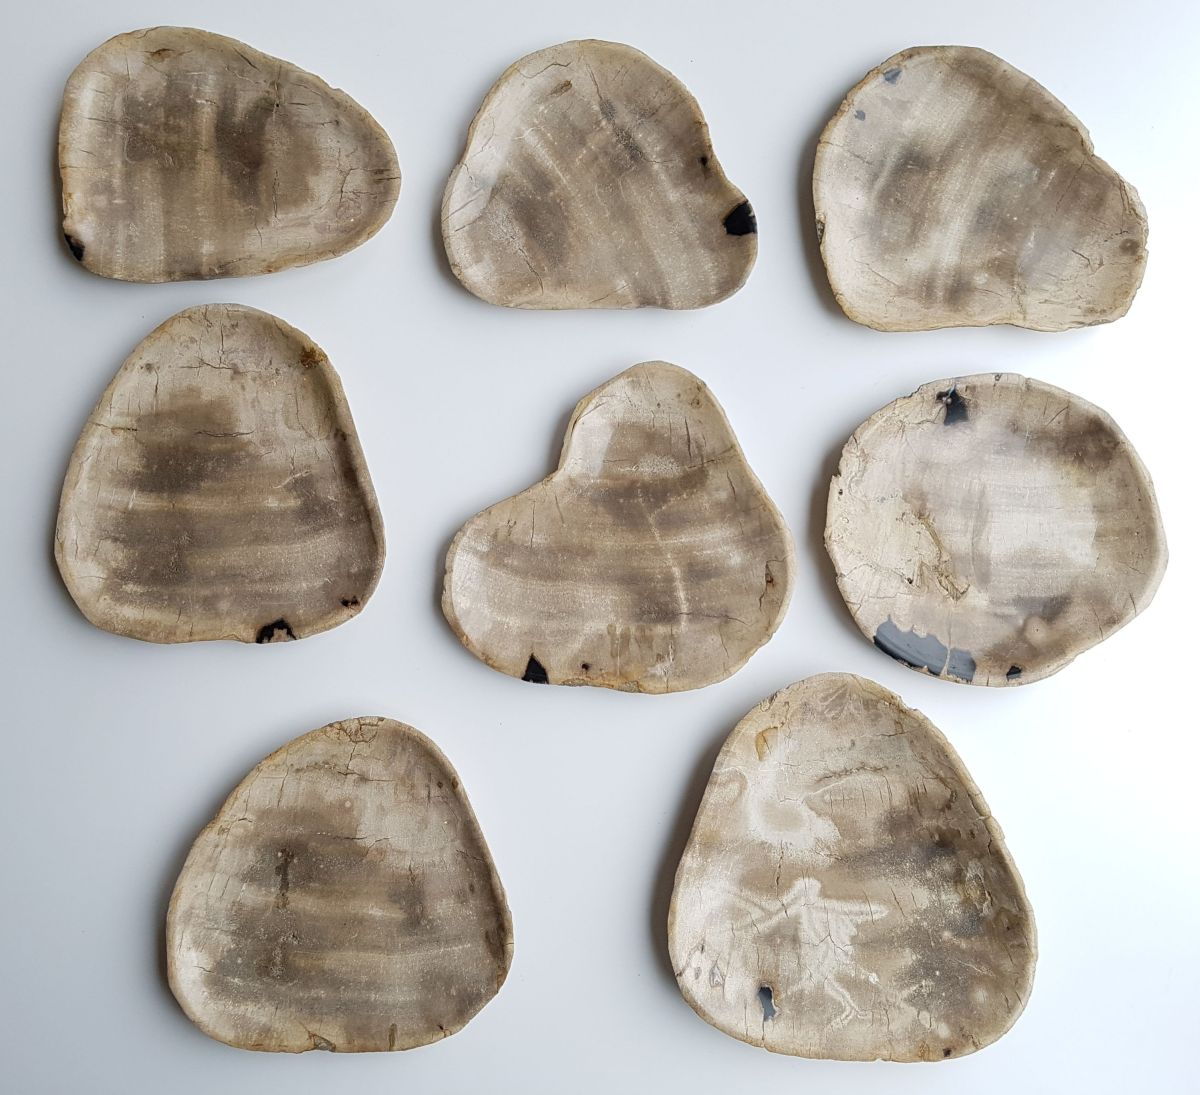 Plate petrified wood 33004g